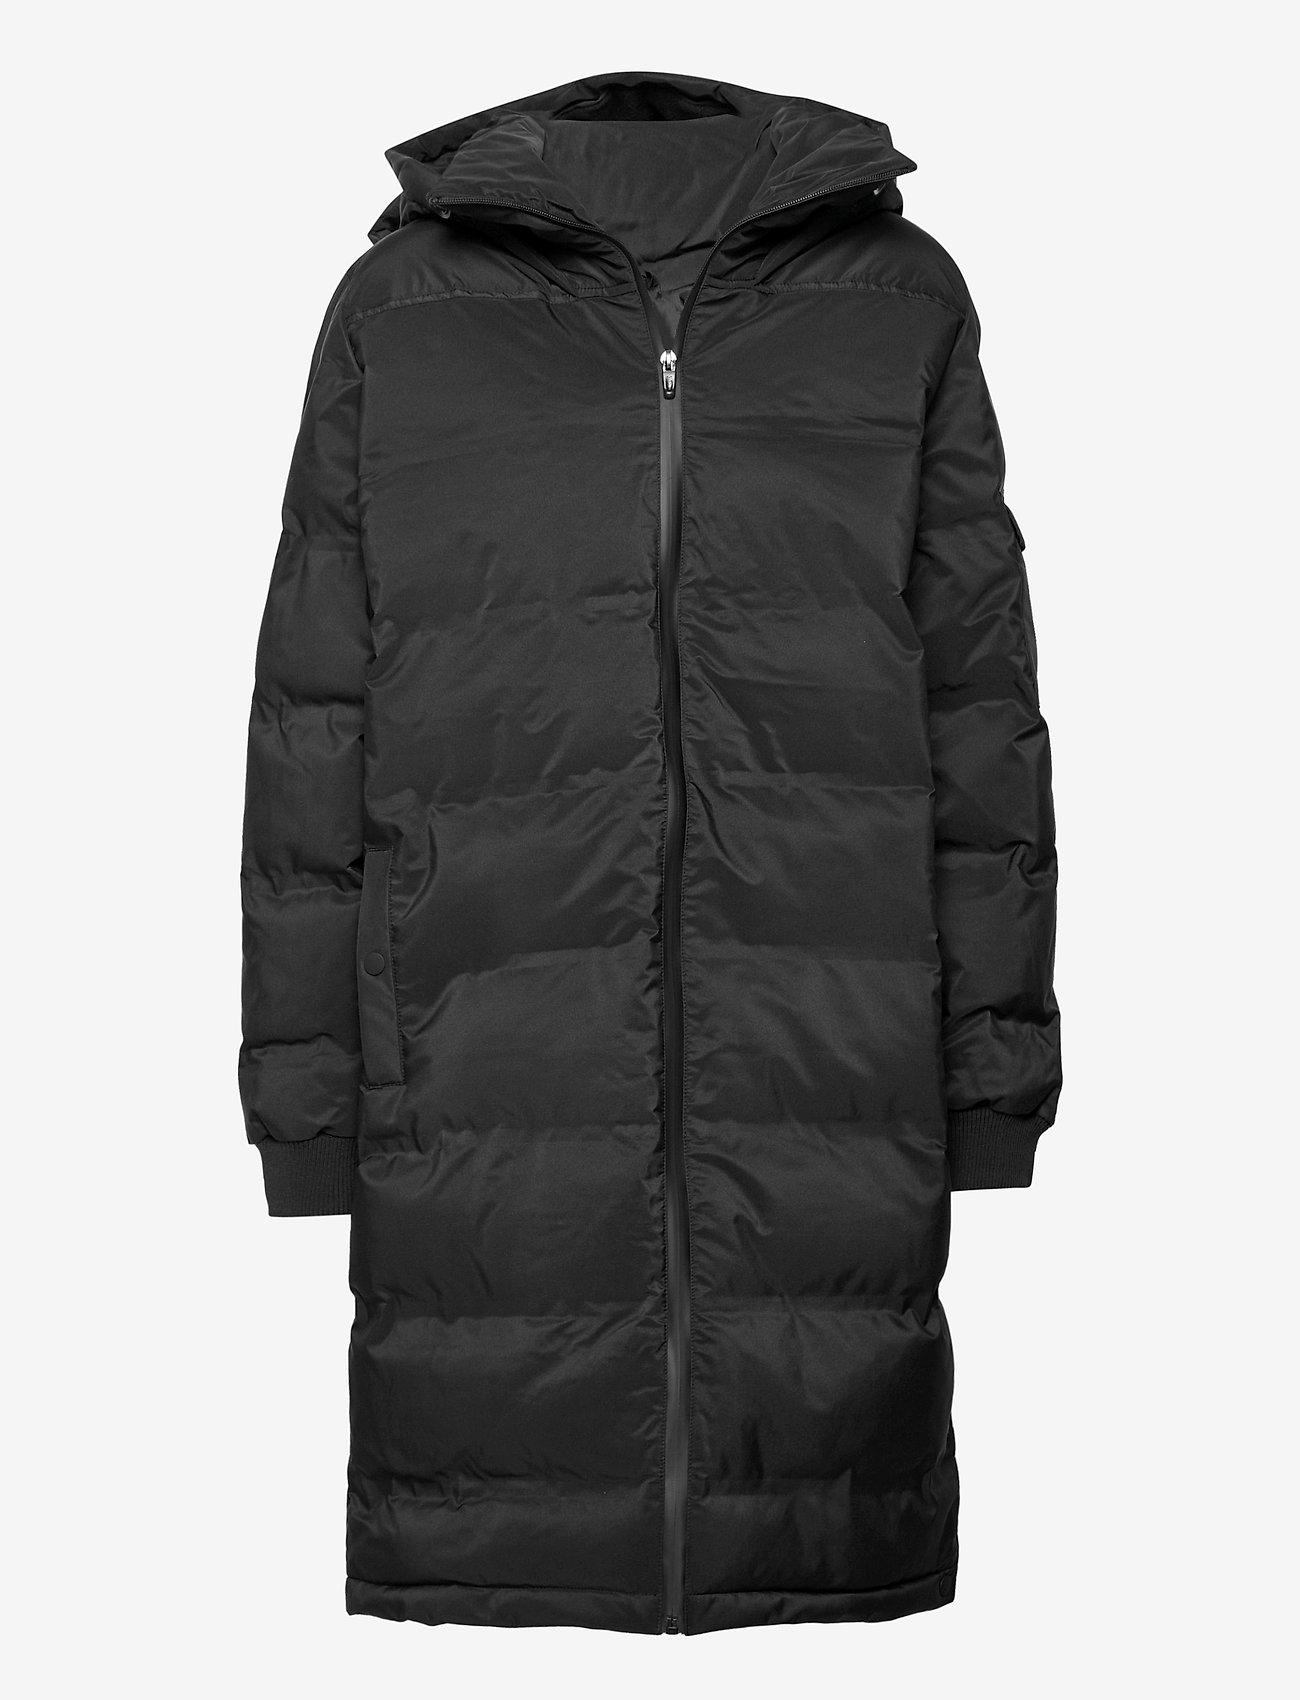 Hummel - hmlCOLUMBO JACKET - sports jackets - black - 0